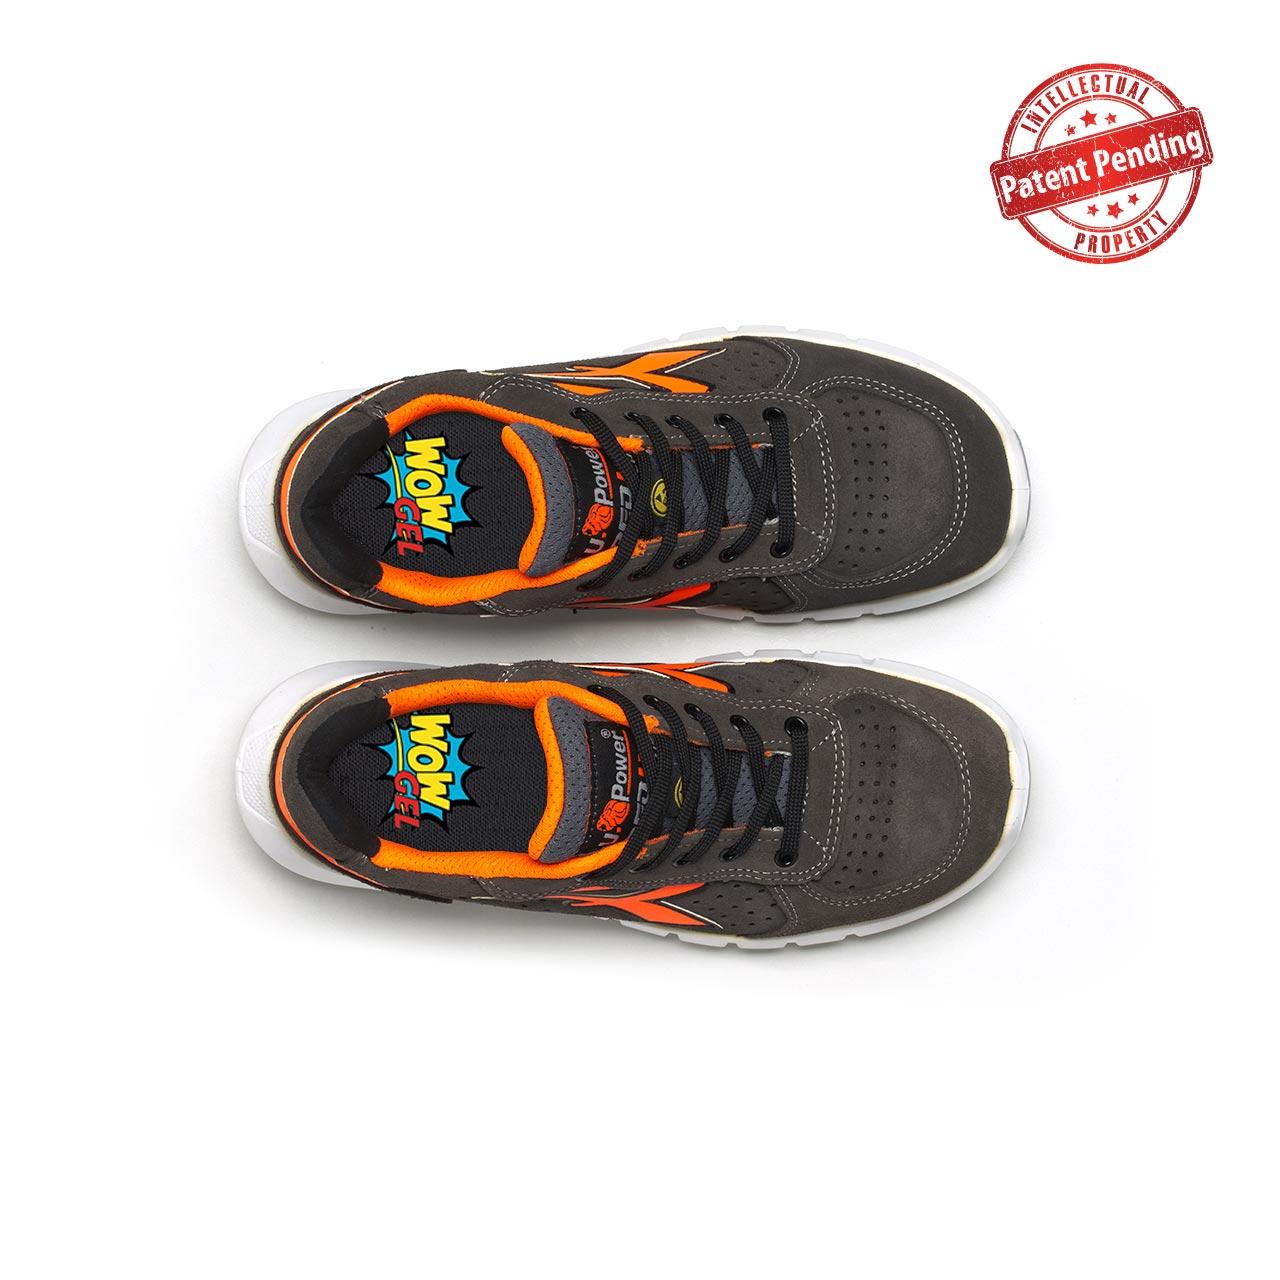 paio di scarpe antinfortunistiche upower modello sirio plus linea redup plus vista top